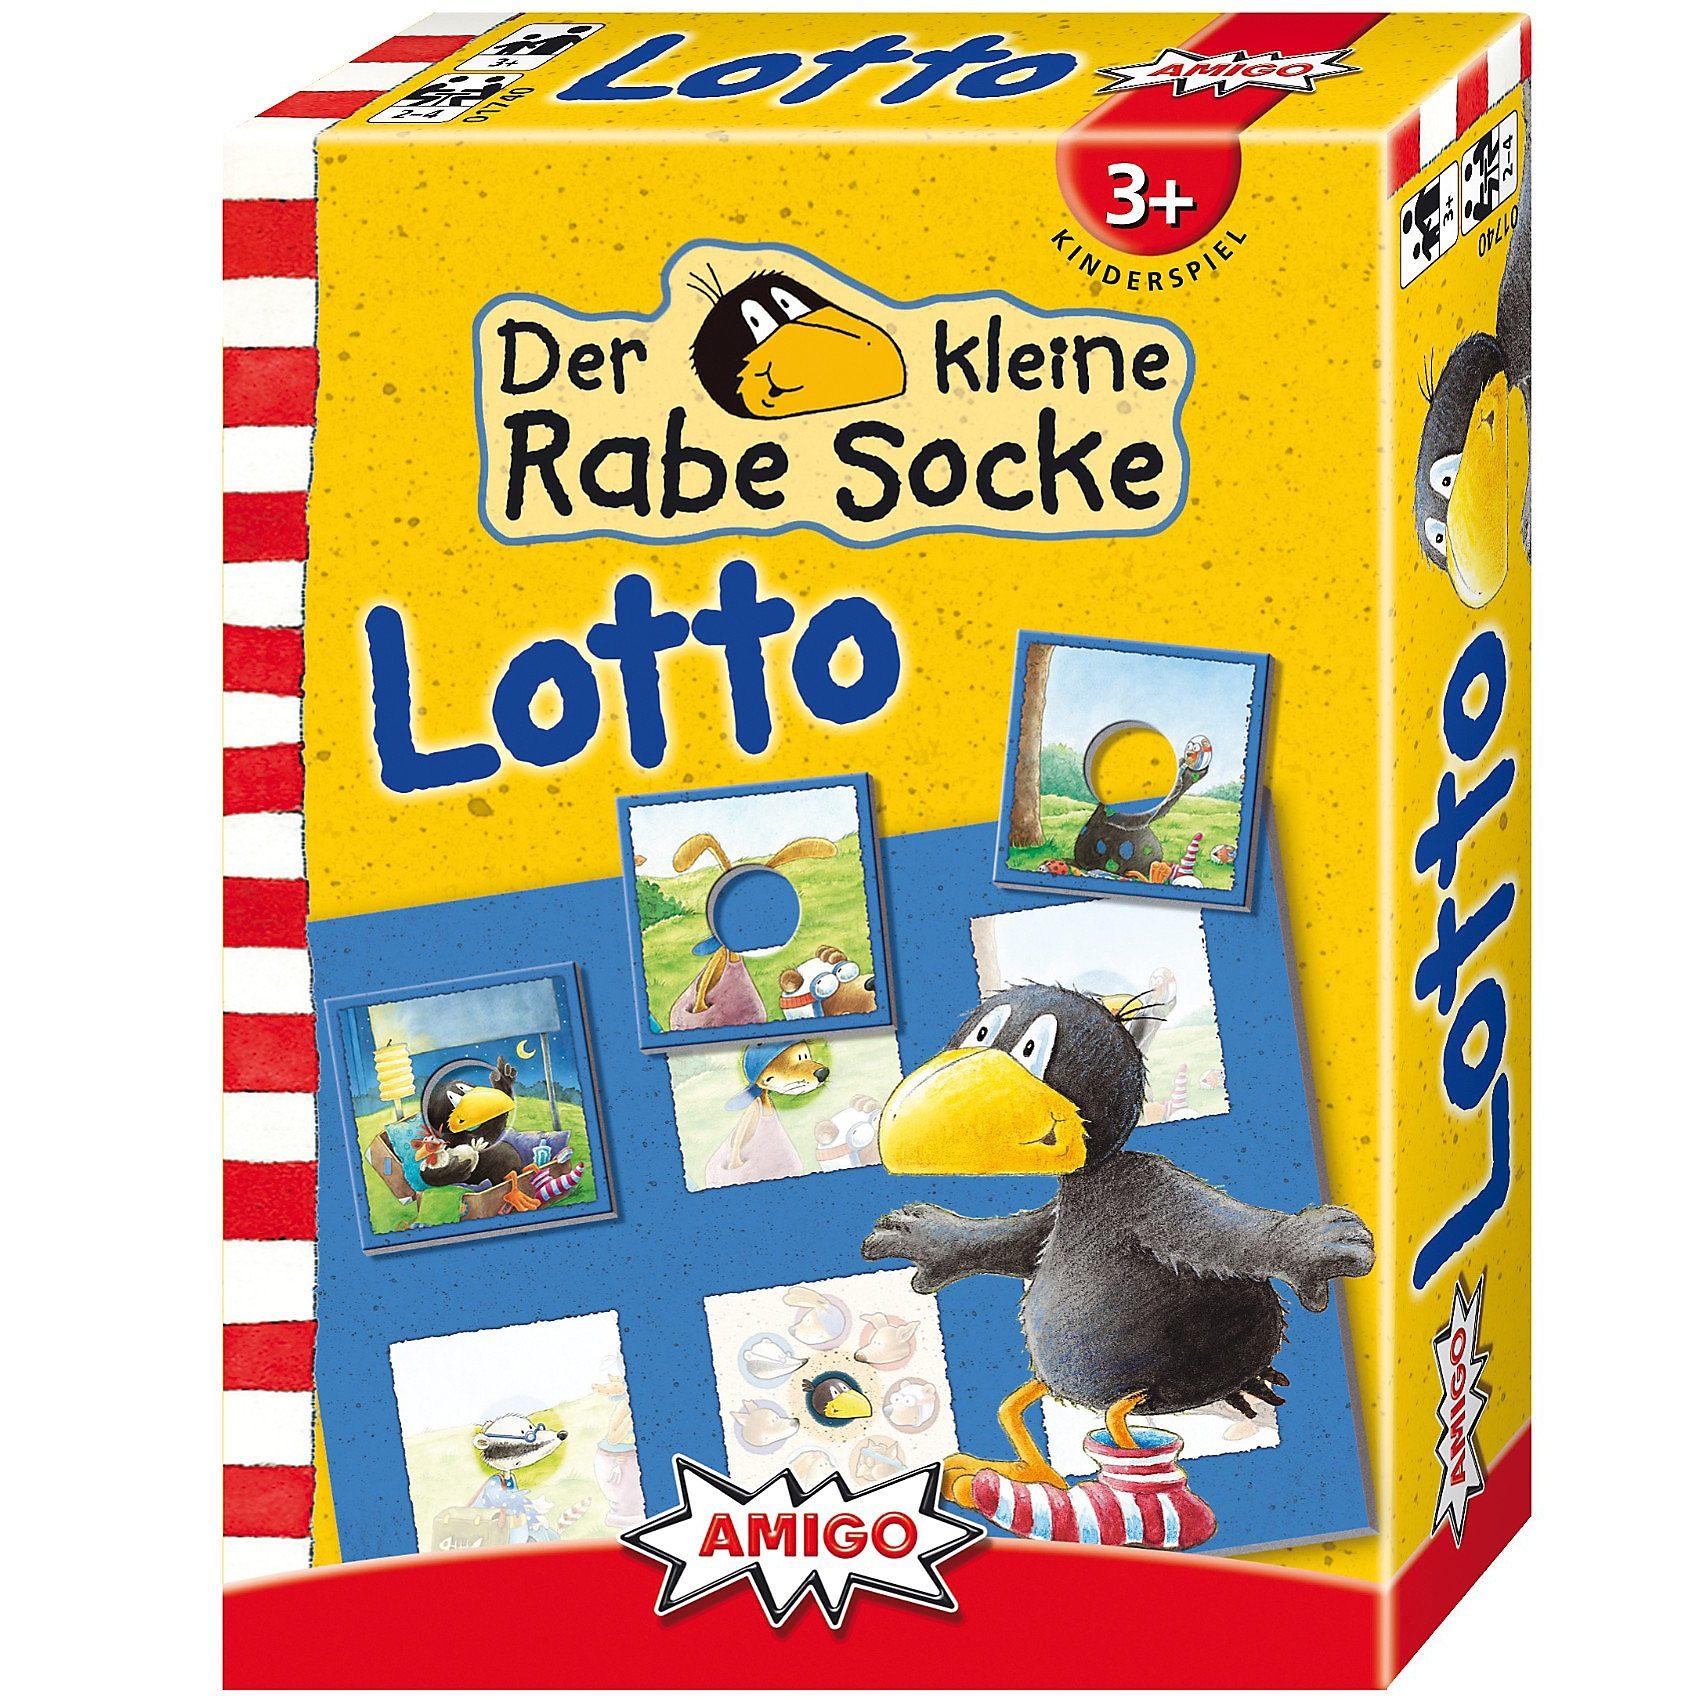 Amigo Rabe Socke - Lotto